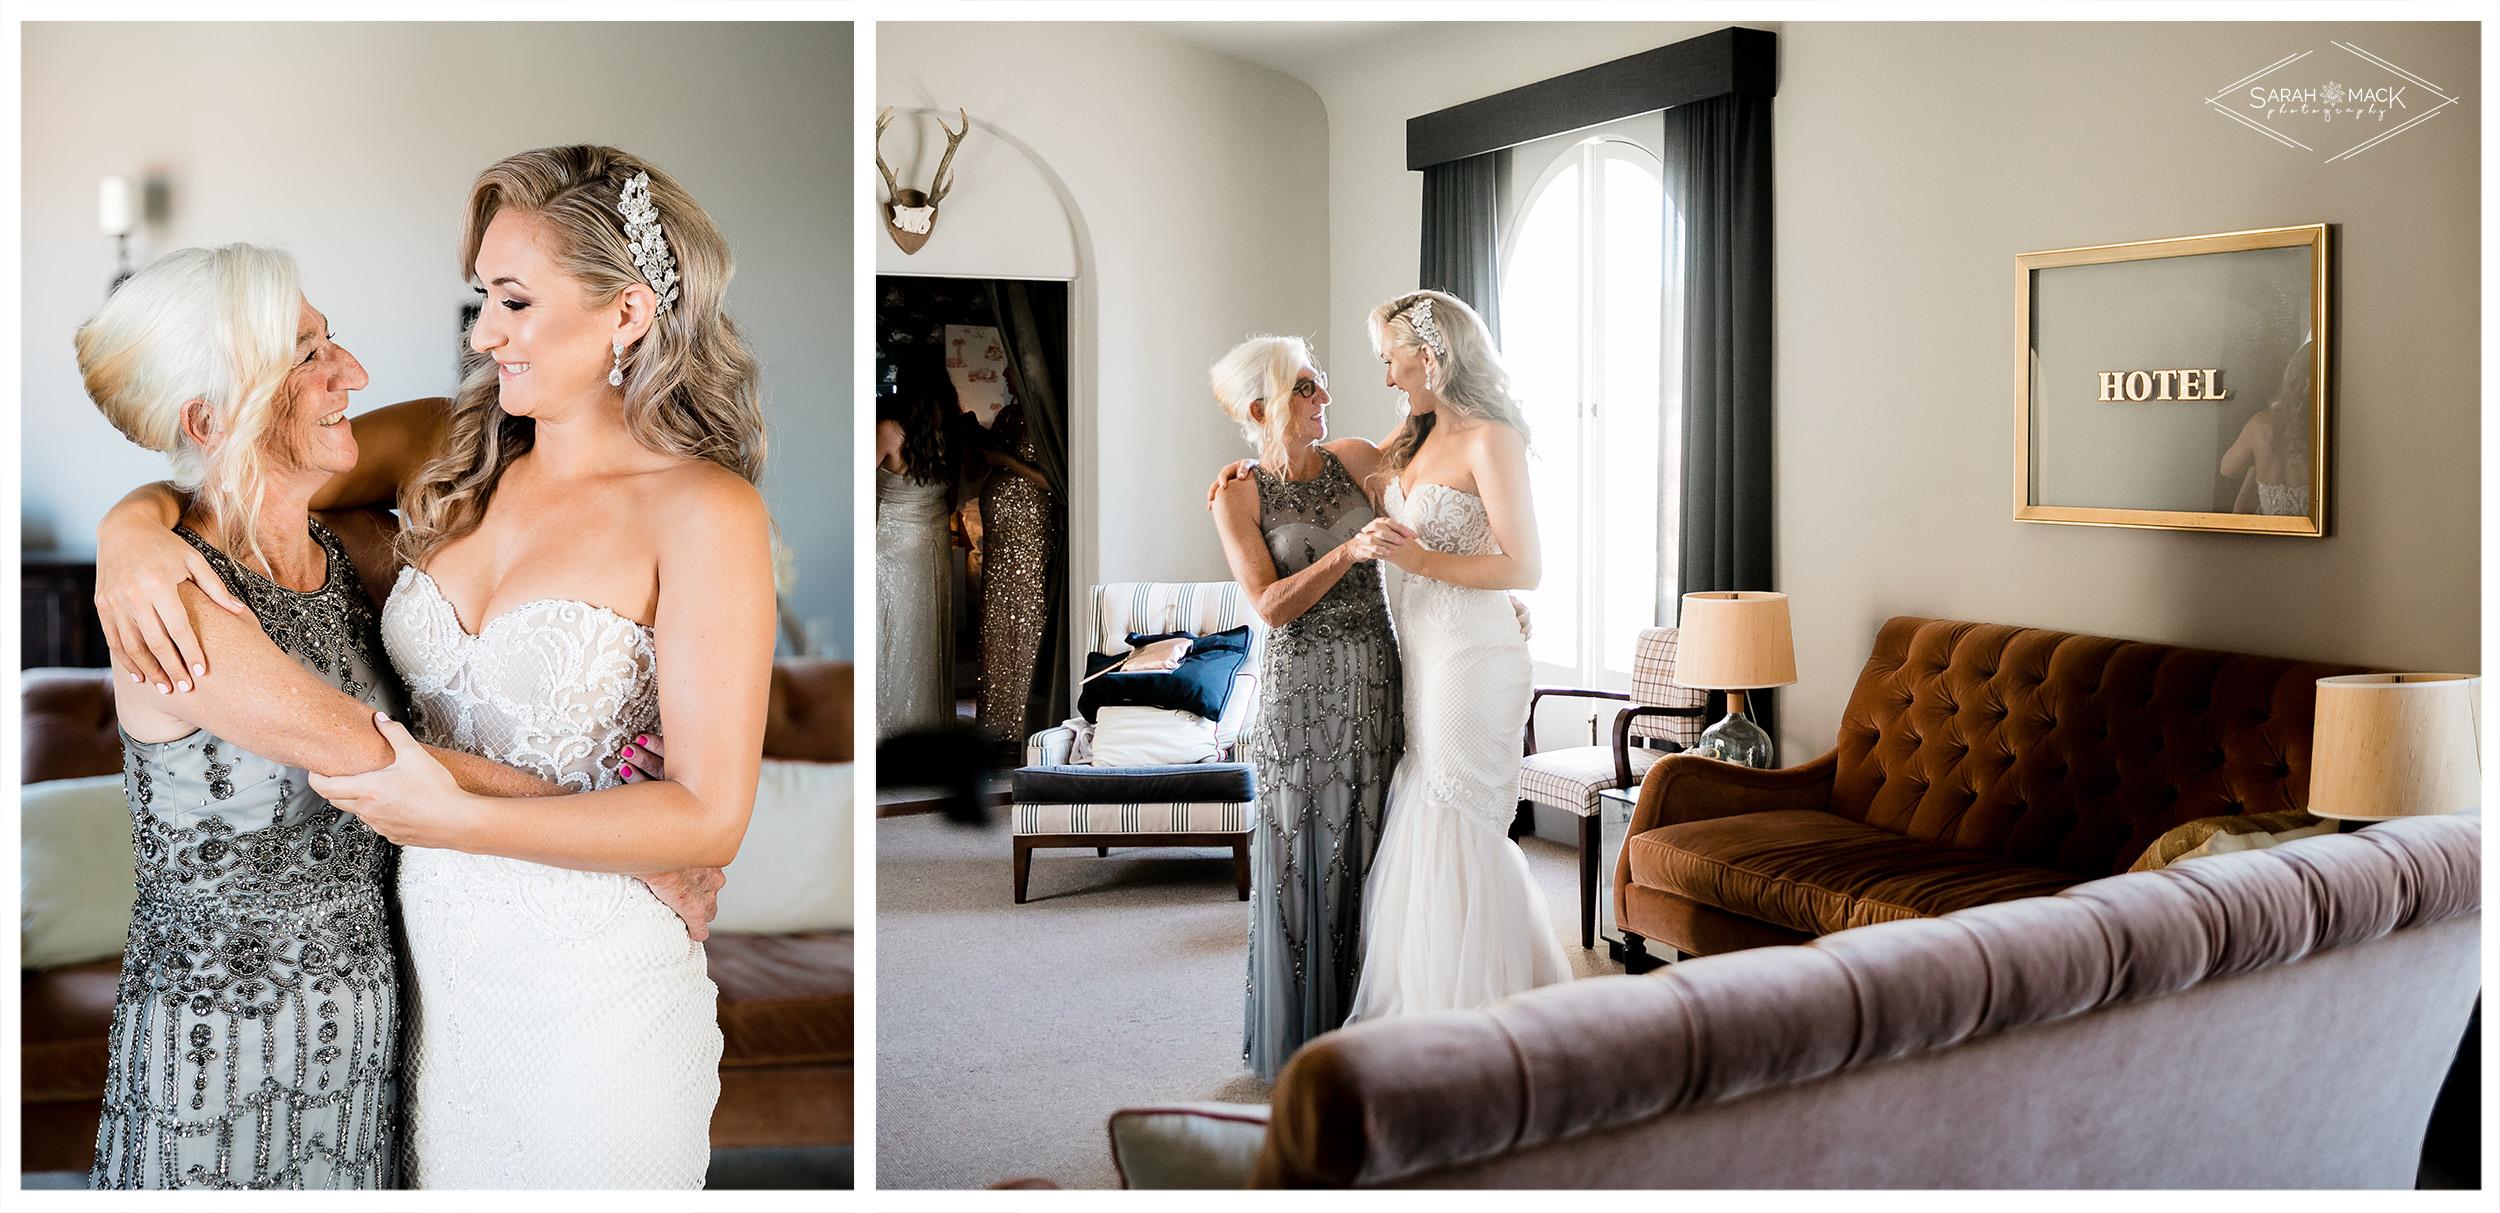 MK-Santa-Monica-Catholic-Church-Wedding-Photography-8.jpg